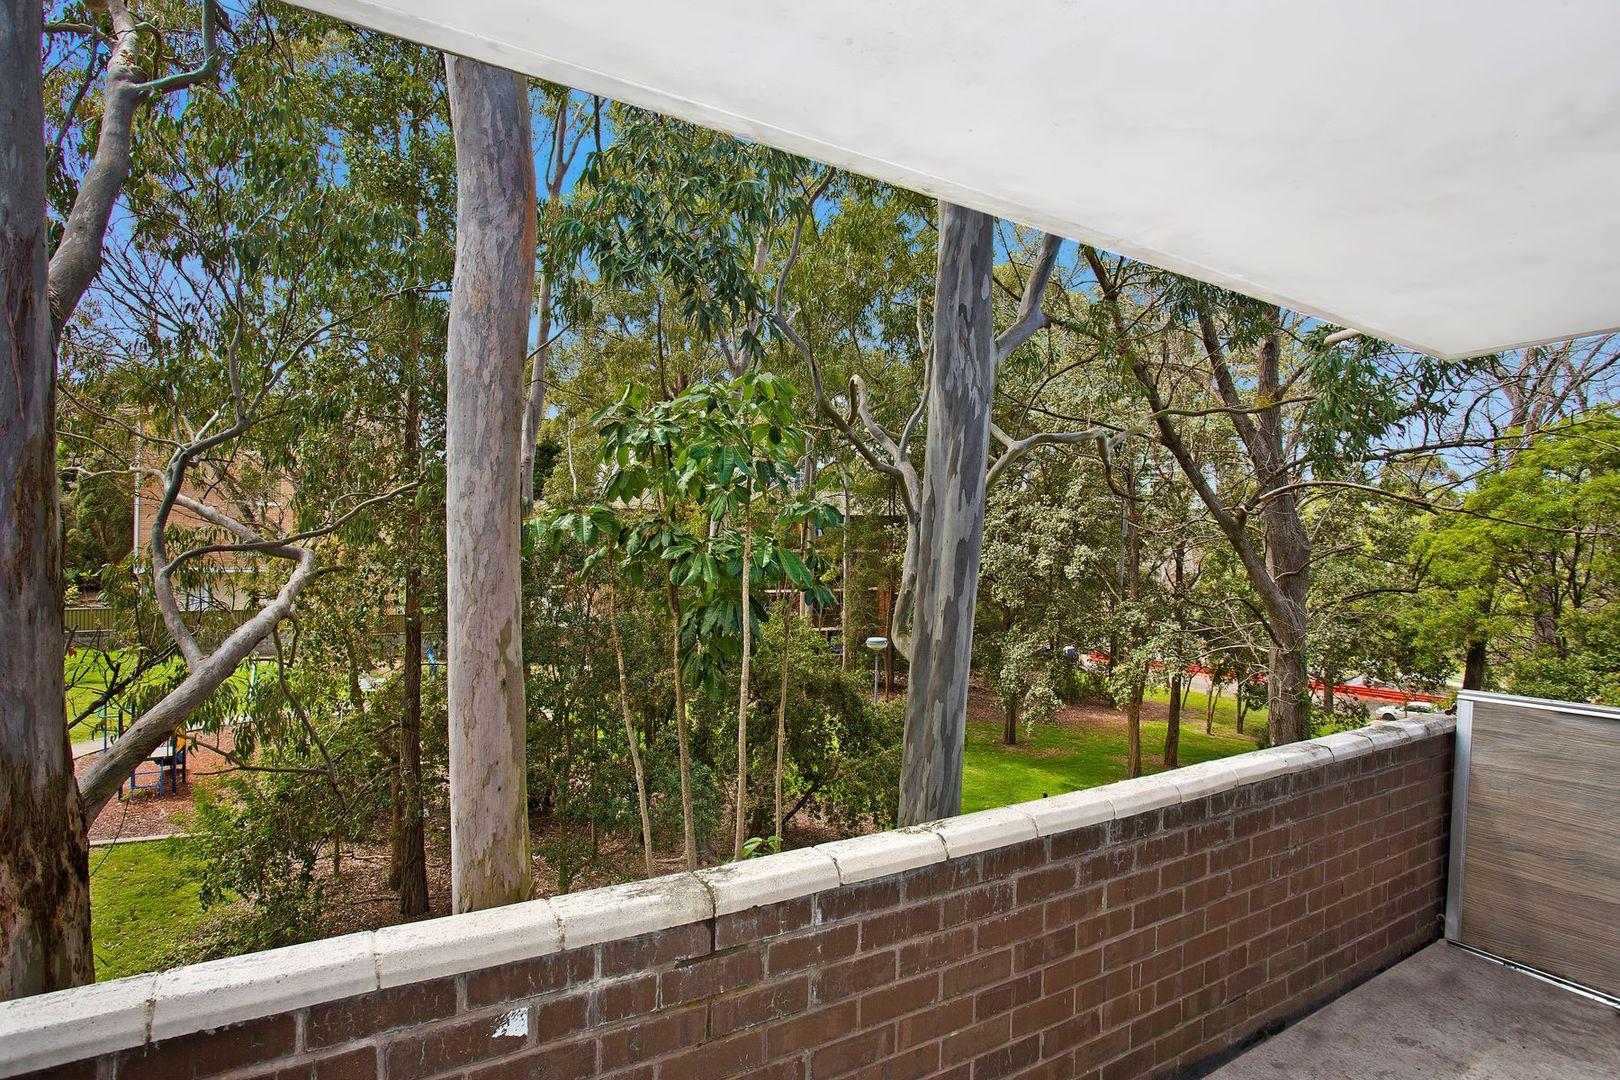 15/2-4 Lachlan Avenue, Macquarie Park NSW 2113, Image 1